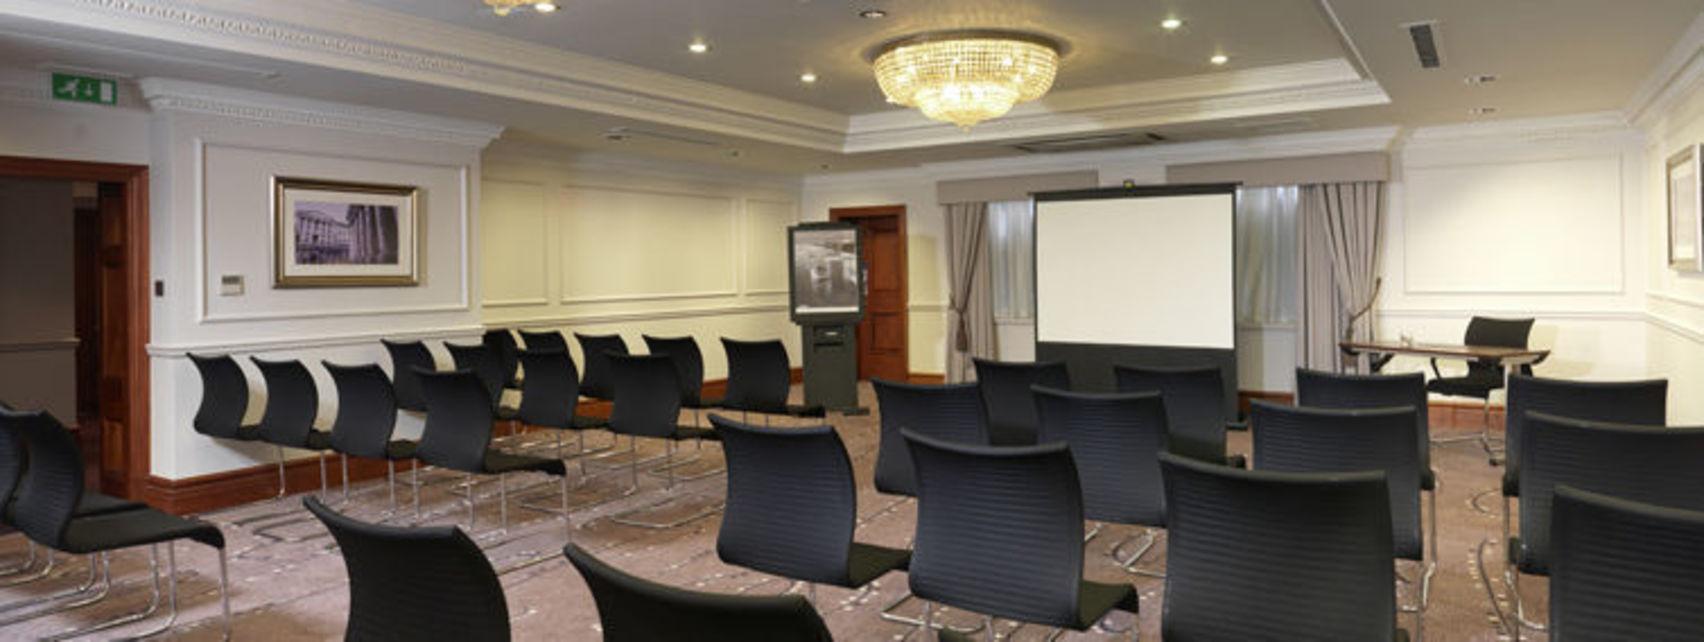 Albion Room, Thistle Holborn - Kingsley